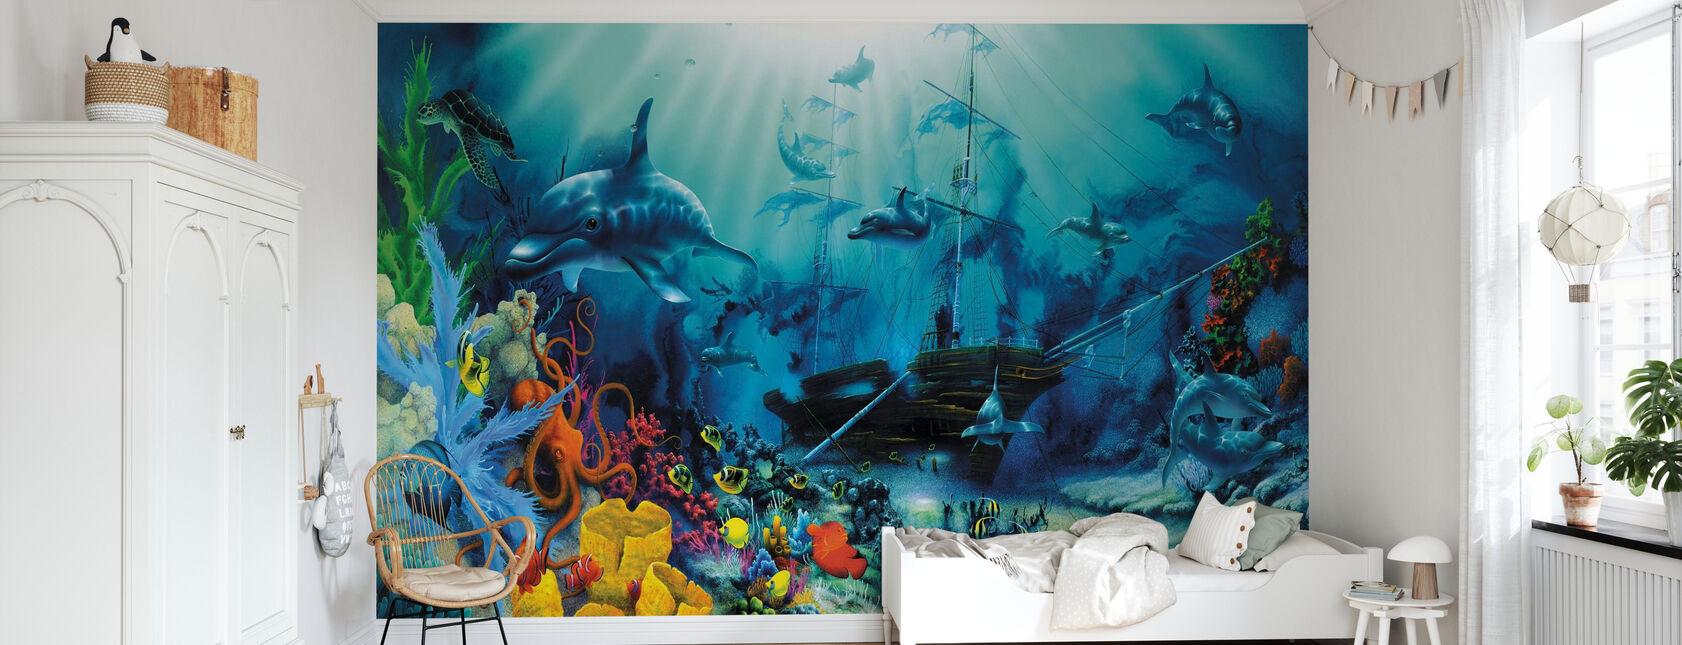 Ocean Treasures - Wallpaper - Kids Room